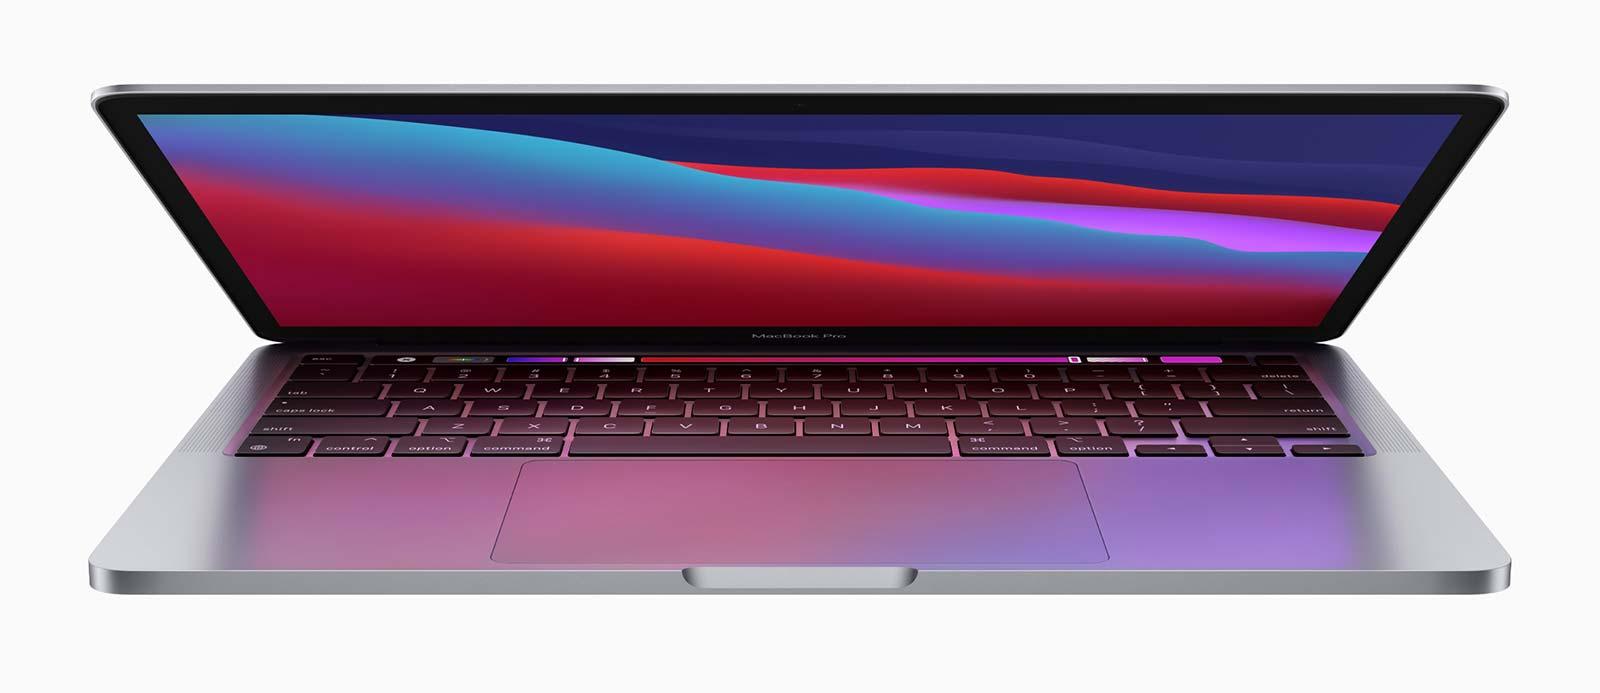 2020 MacBook Pro 13 with Apple M1